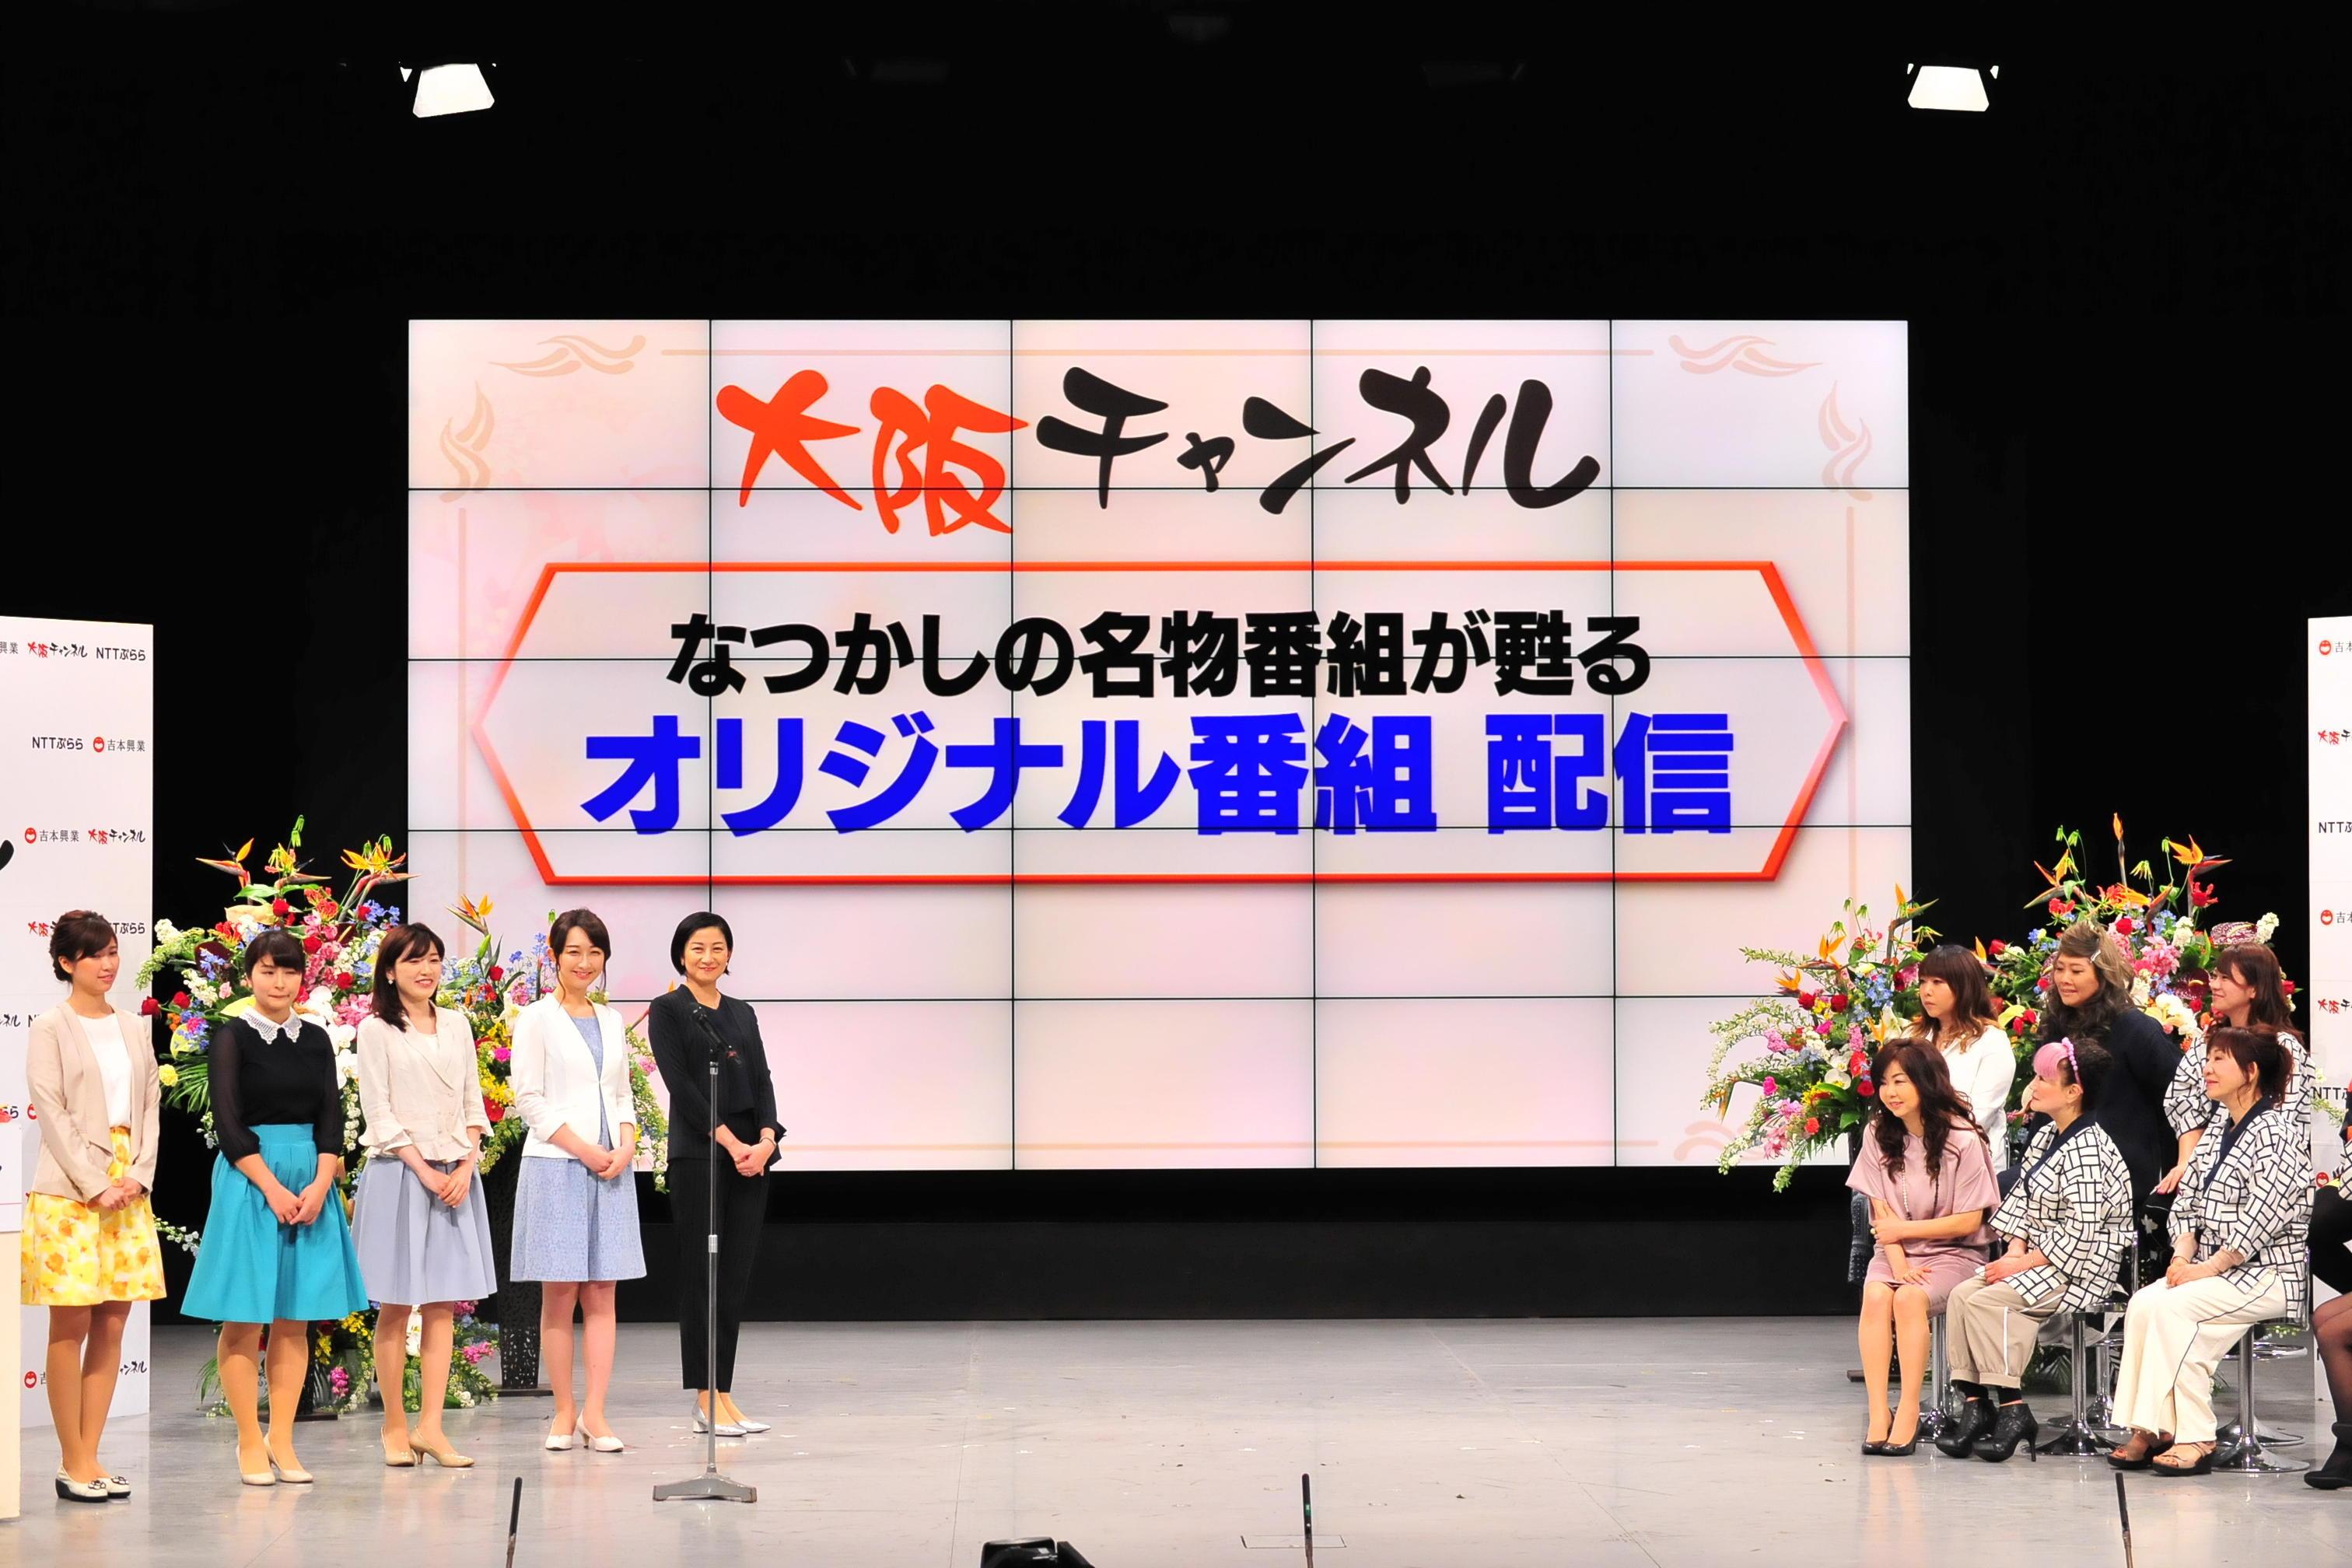 http://news.yoshimoto.co.jp/20170425160301-4ab7827485cf6c3b6a7e49716b3f35eb813d0f8e.jpg